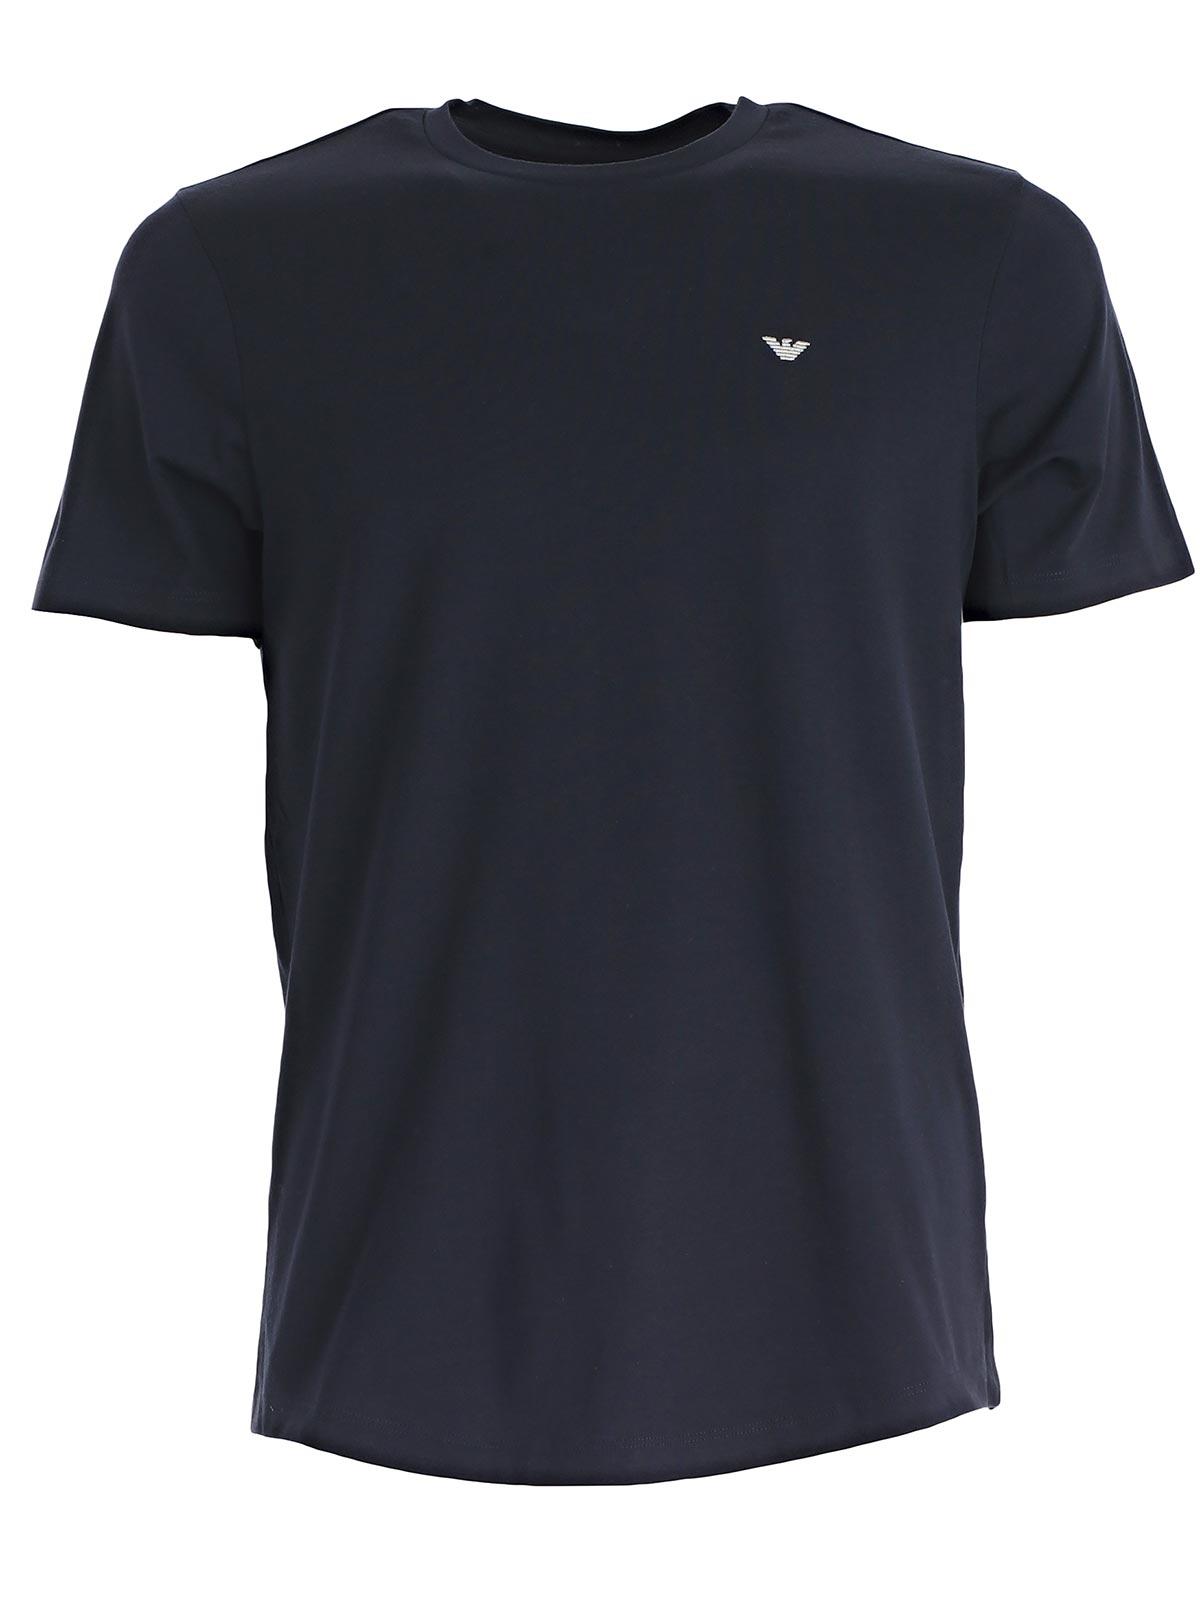 Picture of Emporio Armani T-Shirt